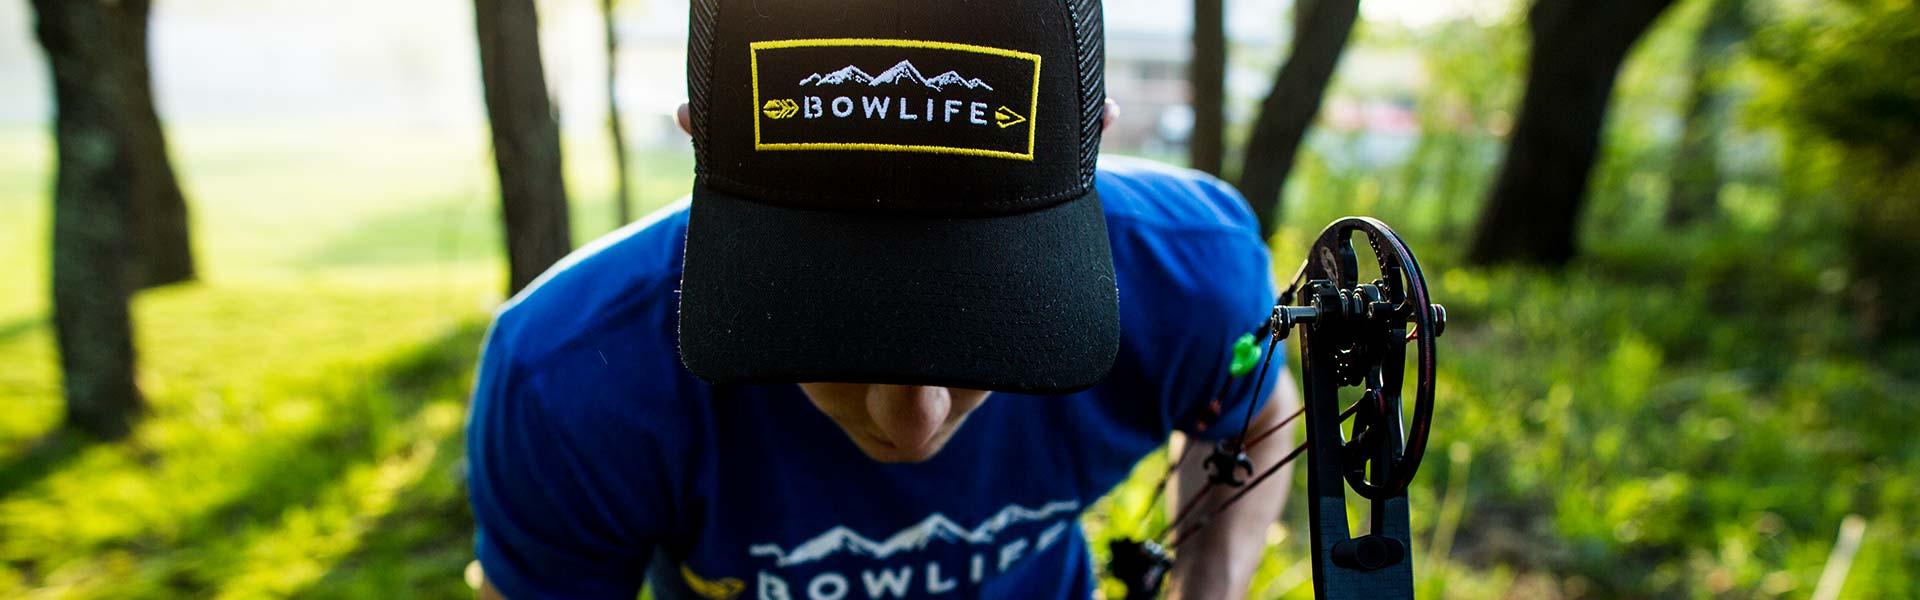 e0e45e72 Bow Life Bowhunting Hats | Bow Hunting Caps | Archery Hats | Bow ...